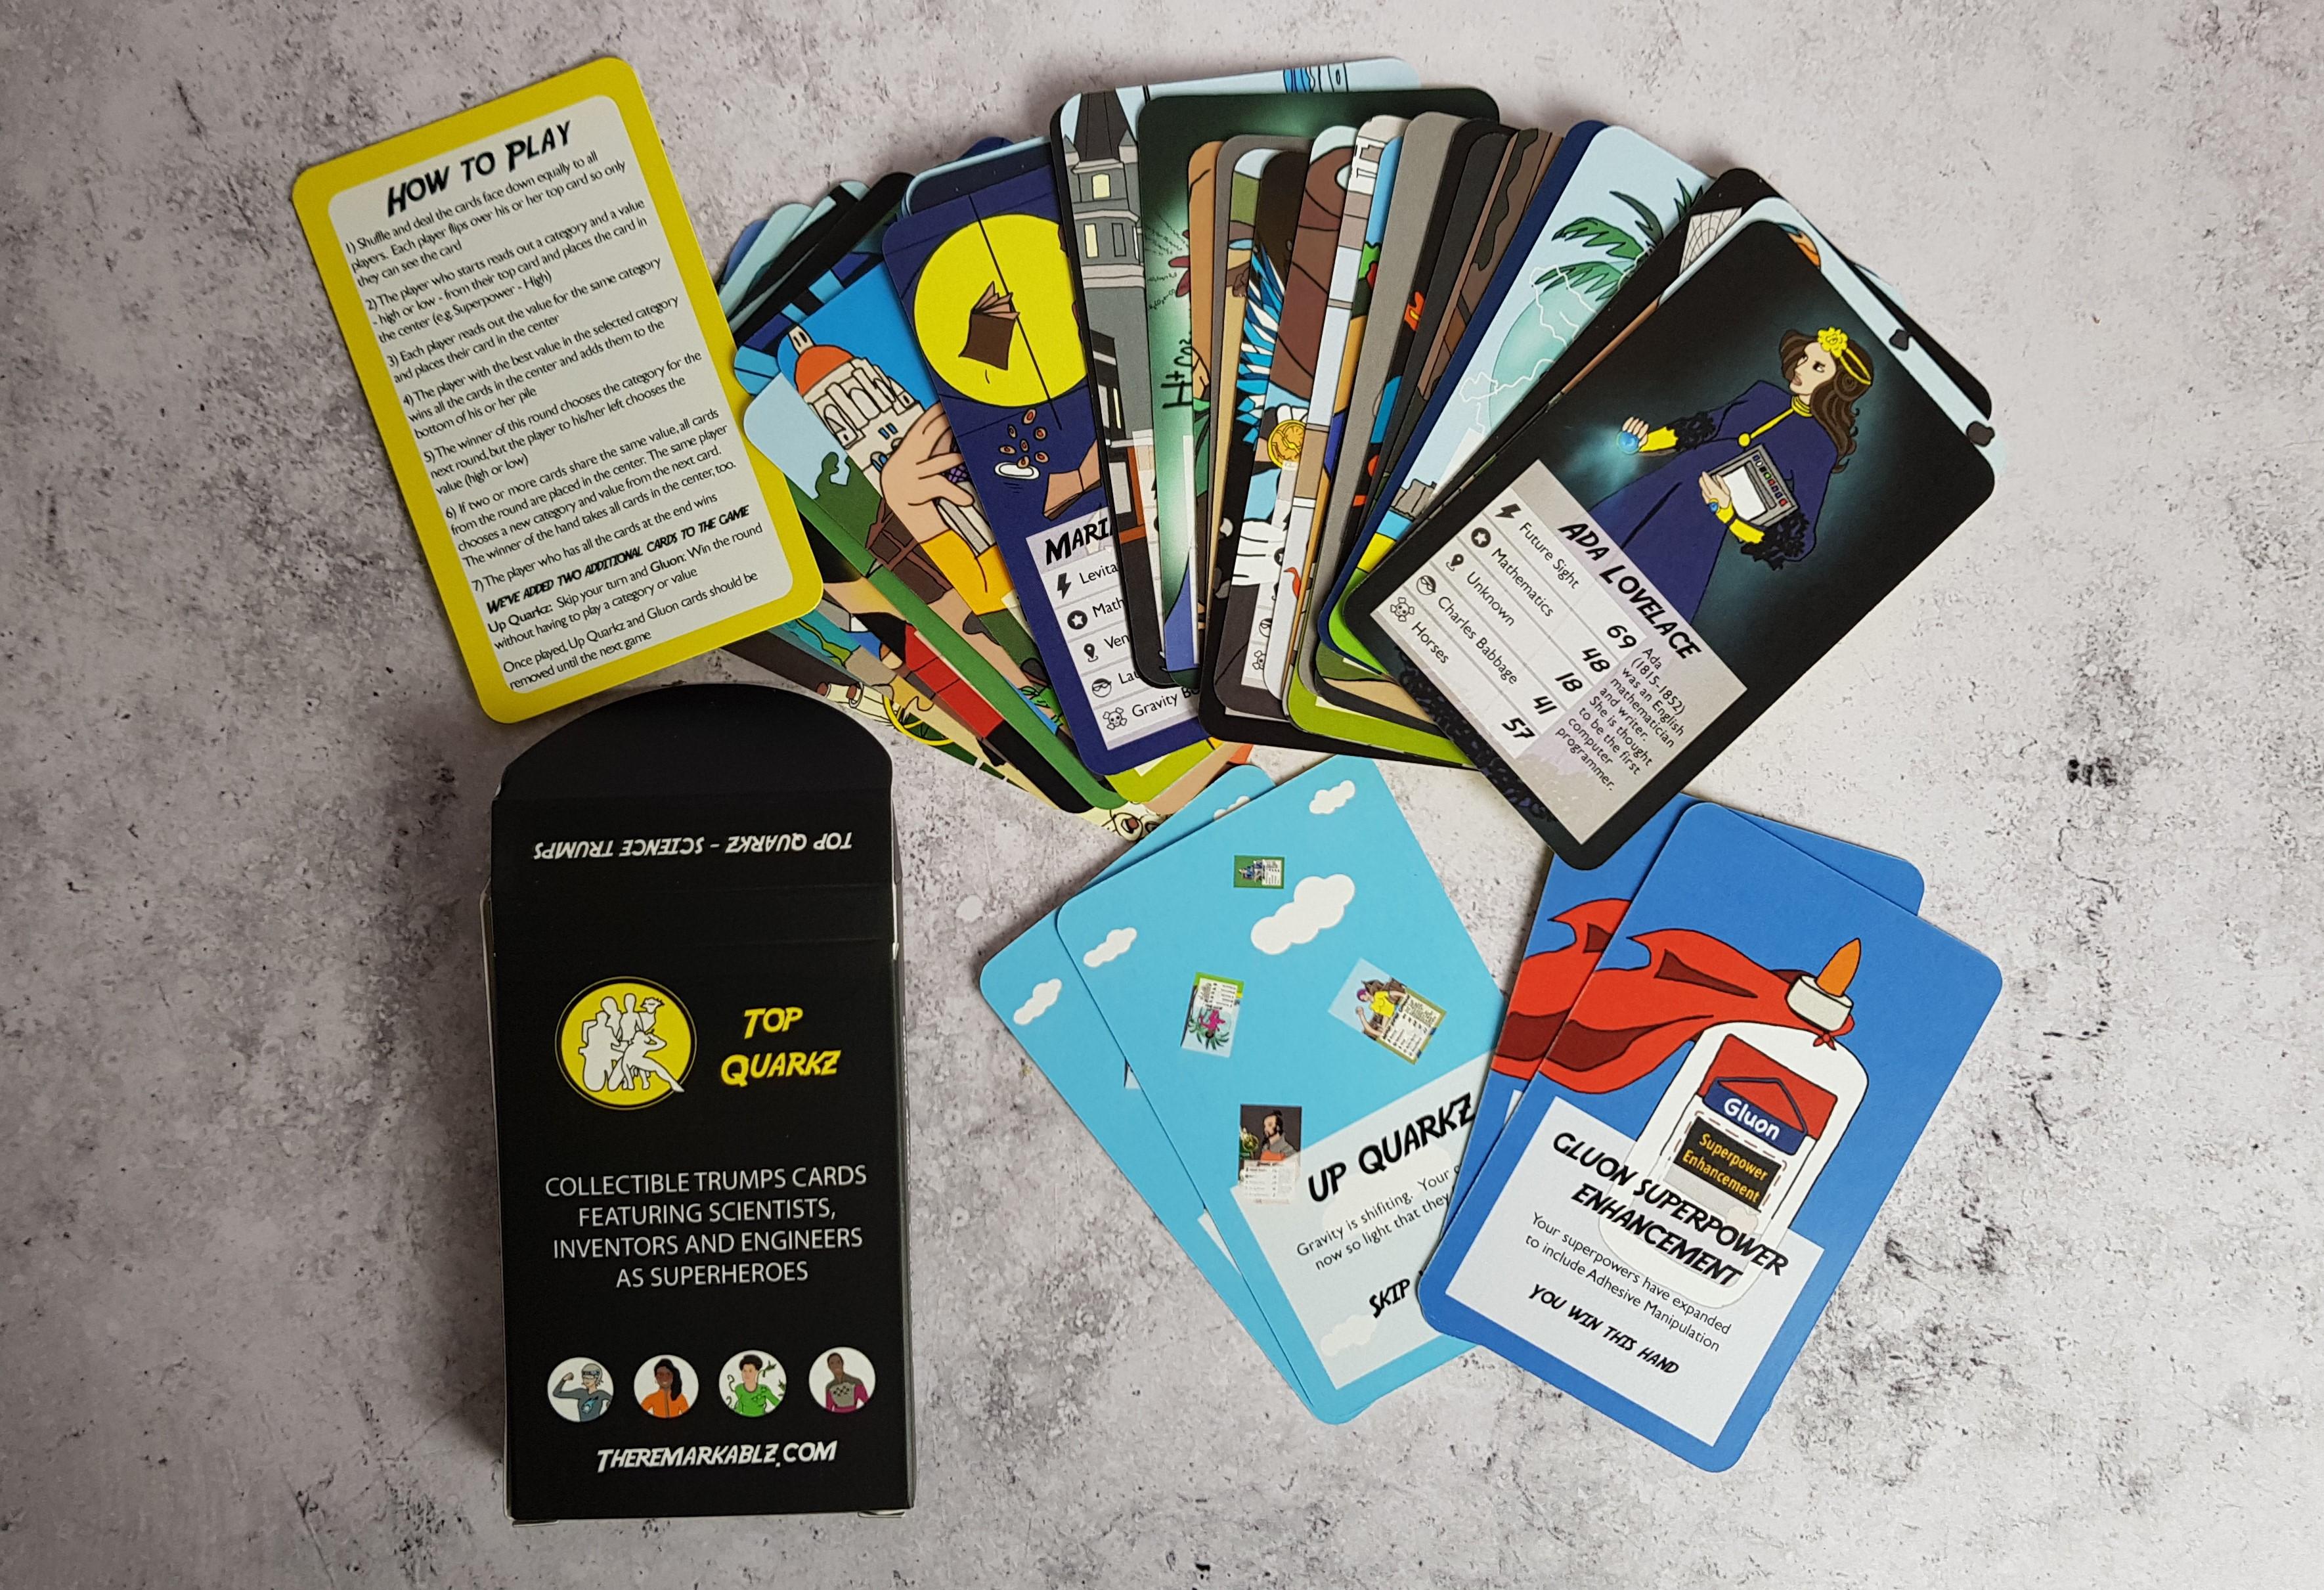 Top Quarkz card game